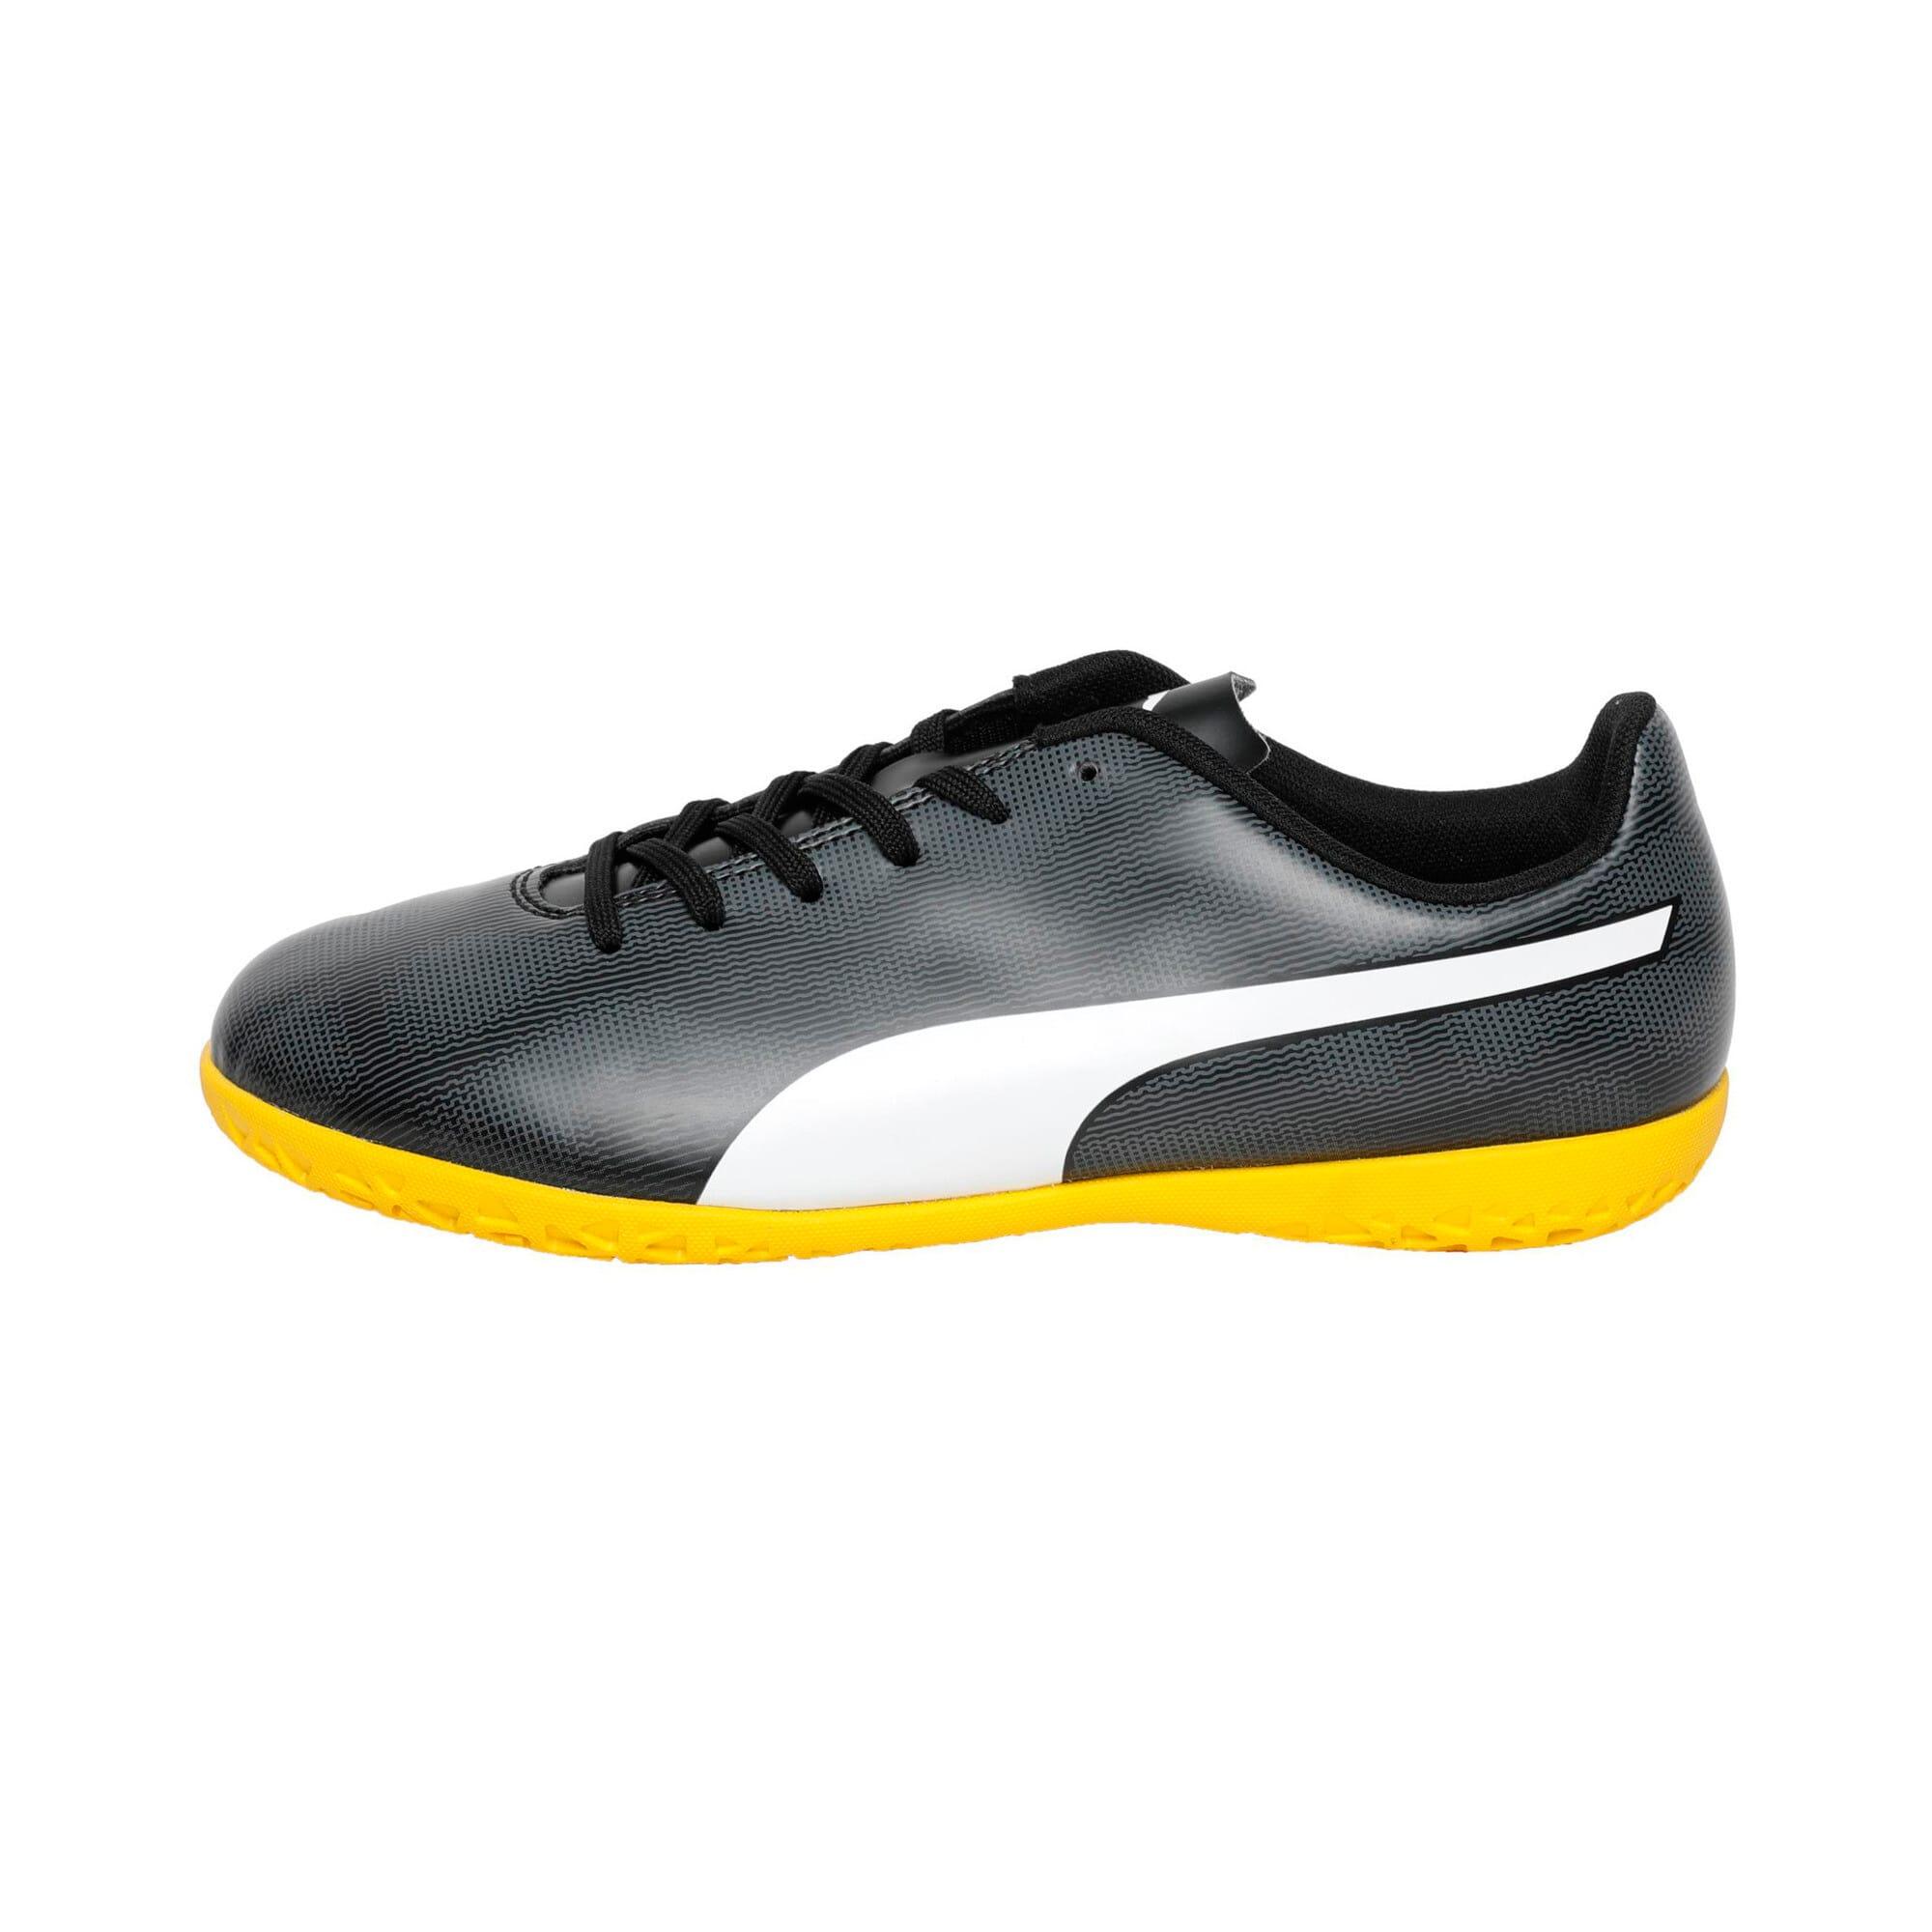 Thumbnail 1 of Rapido IT Youth Football Boots, Black-White-Iron-Yellow, medium-IND